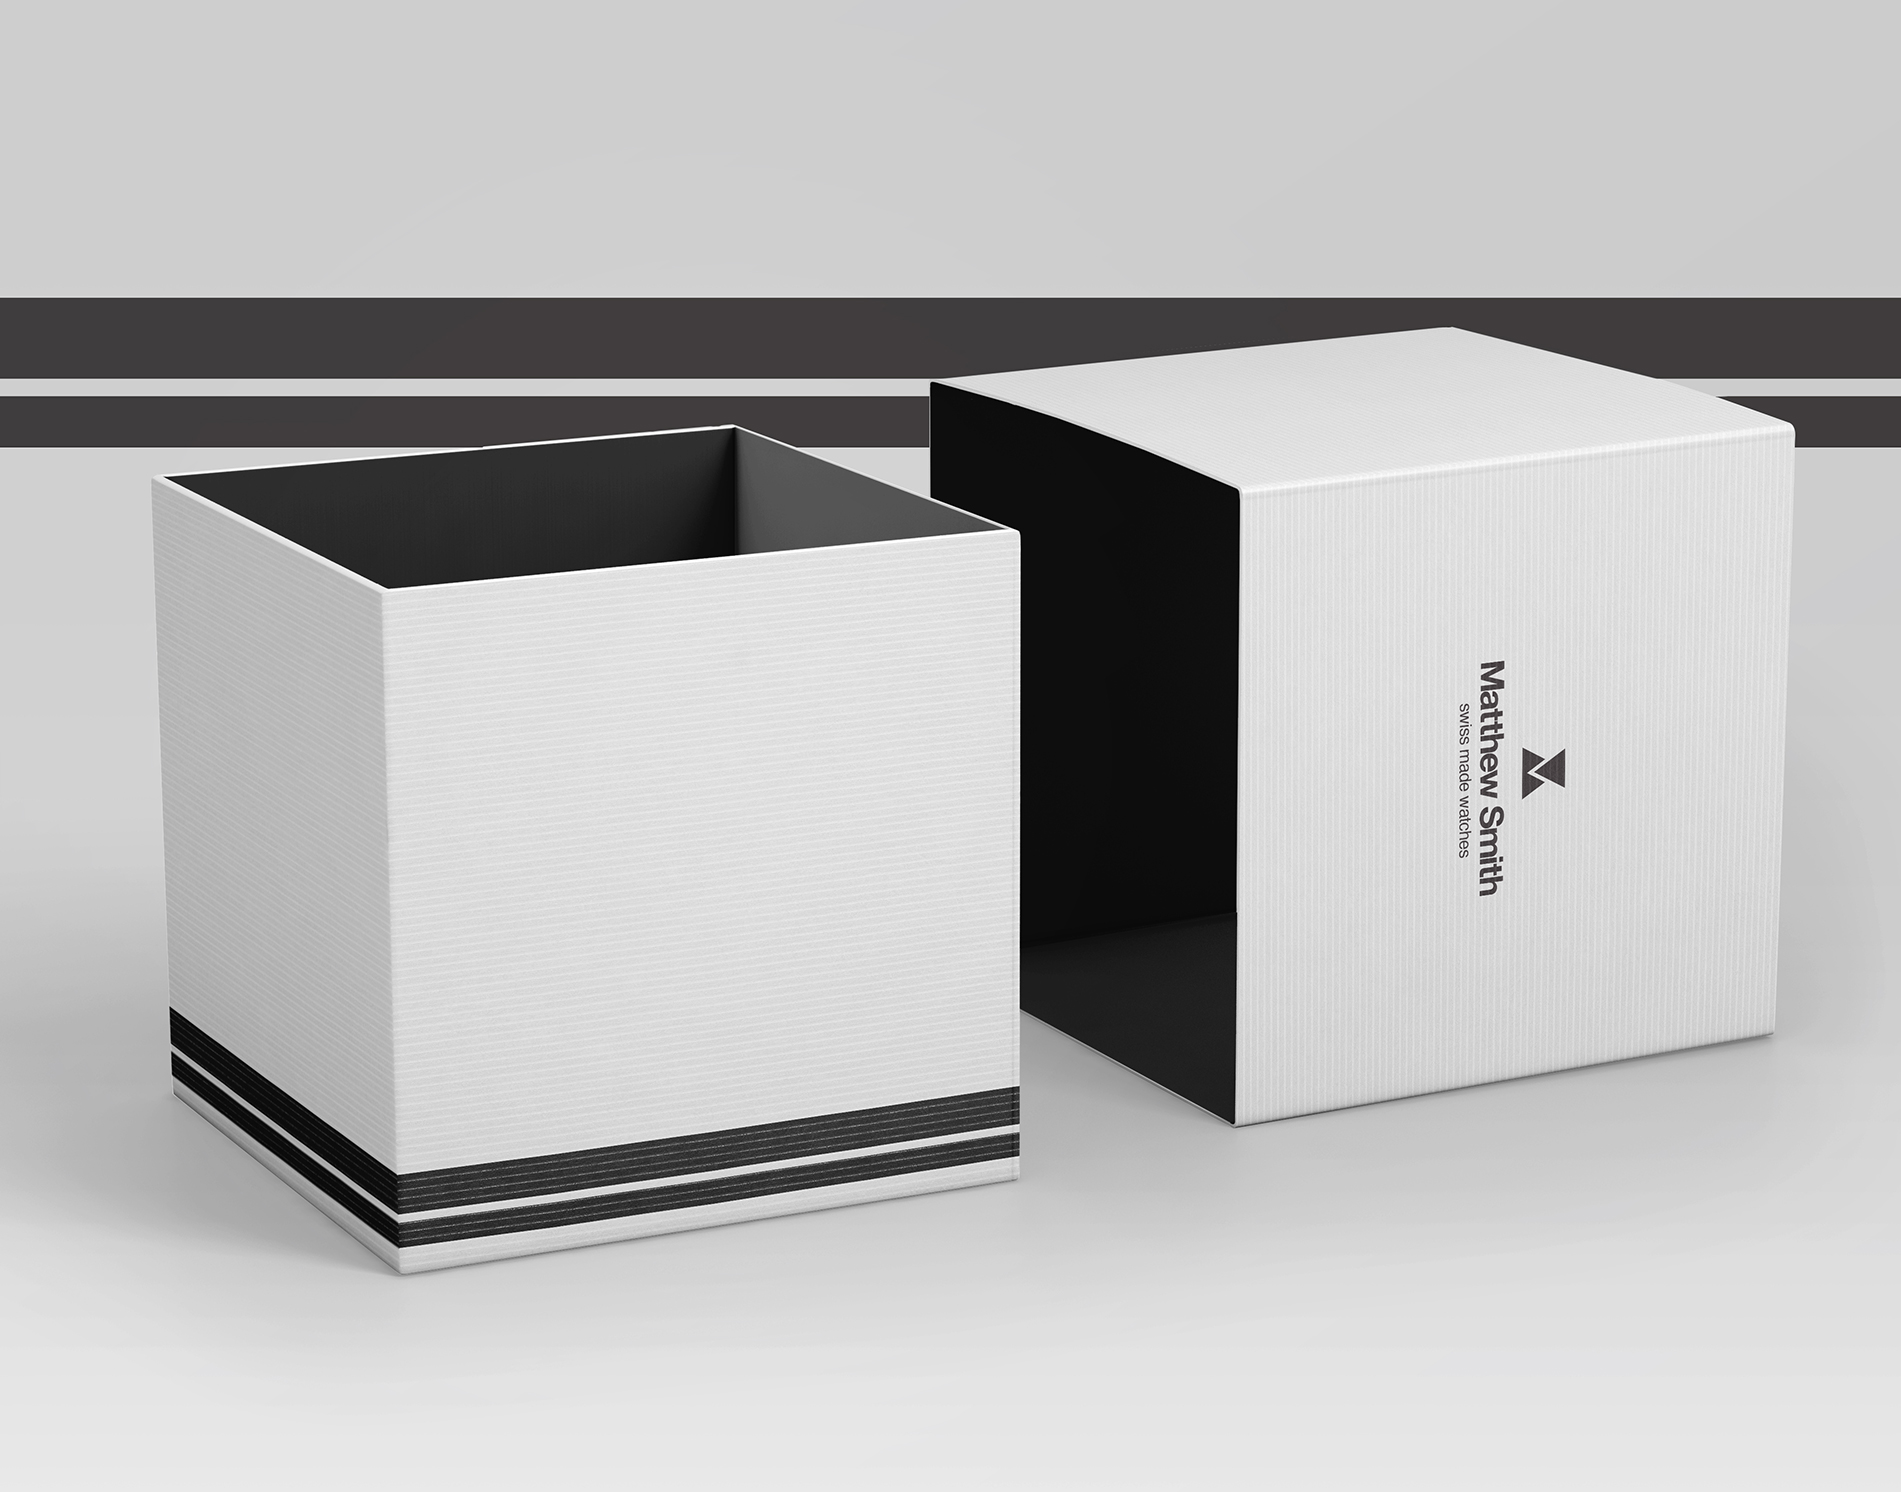 Watch packaging design Matthew Smith